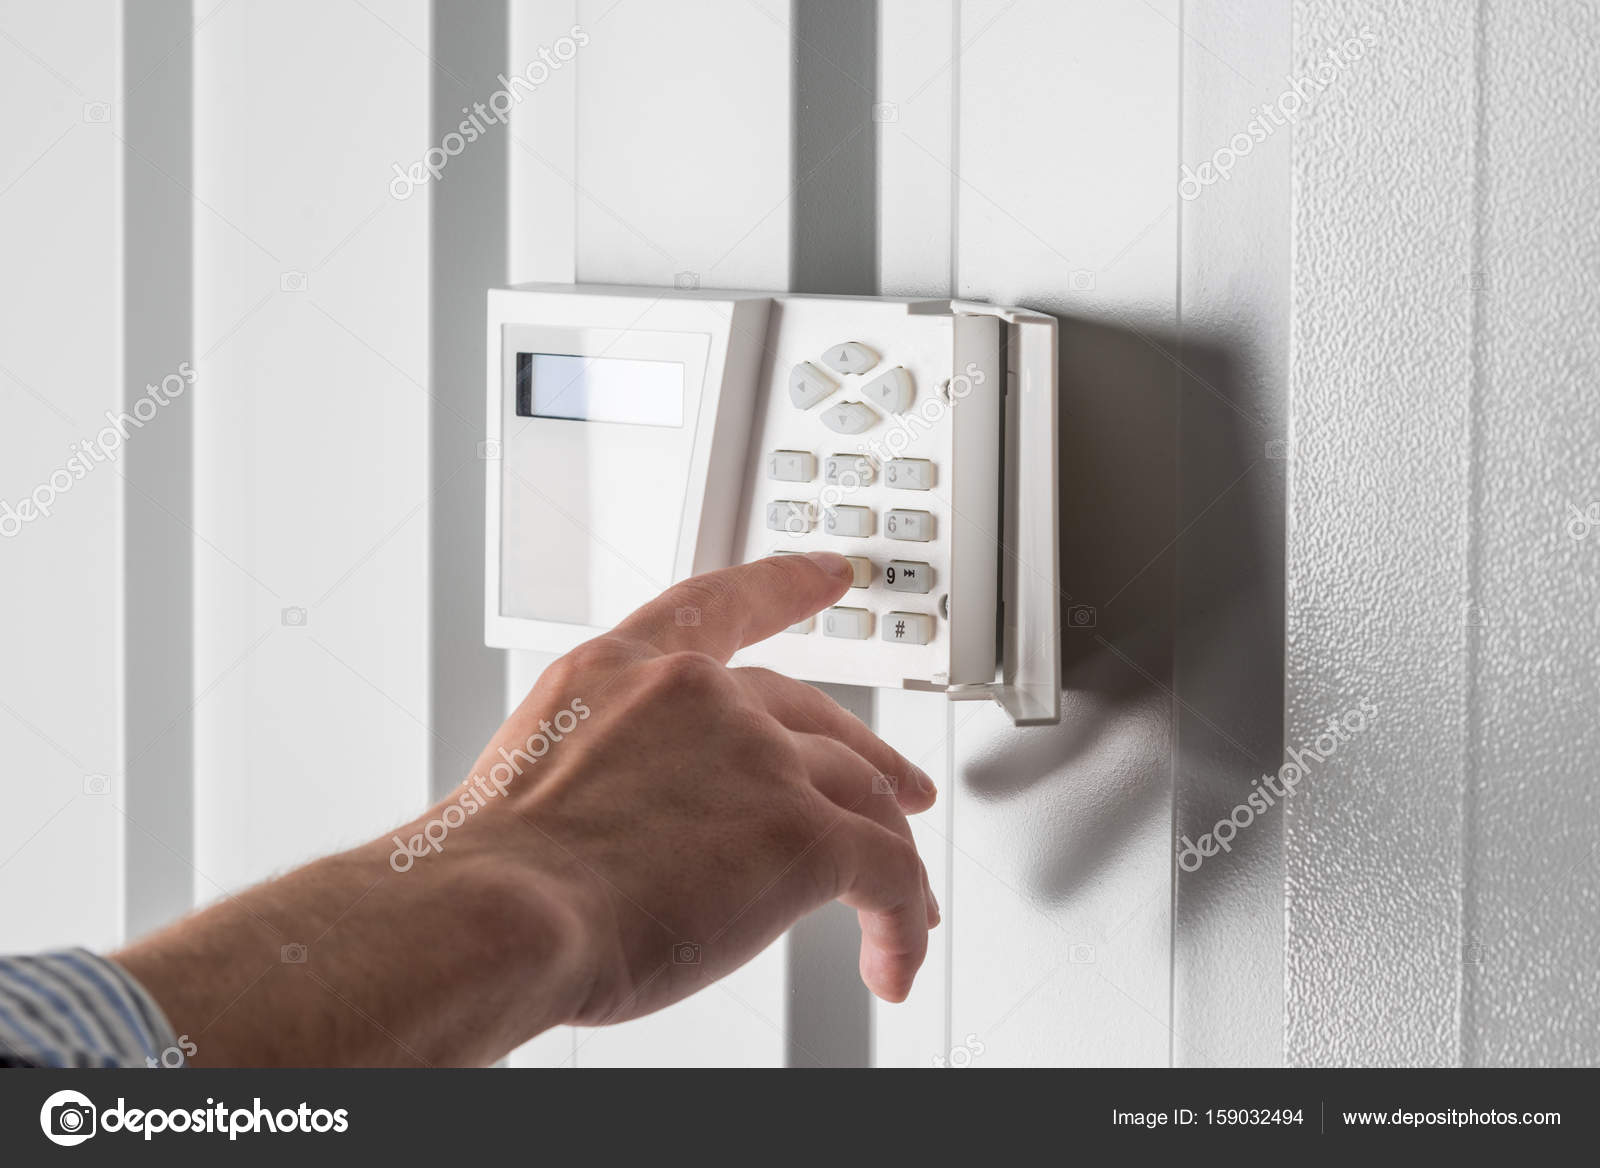 depositphotos_159032494-stock-photo-home-security-alarm.jpg